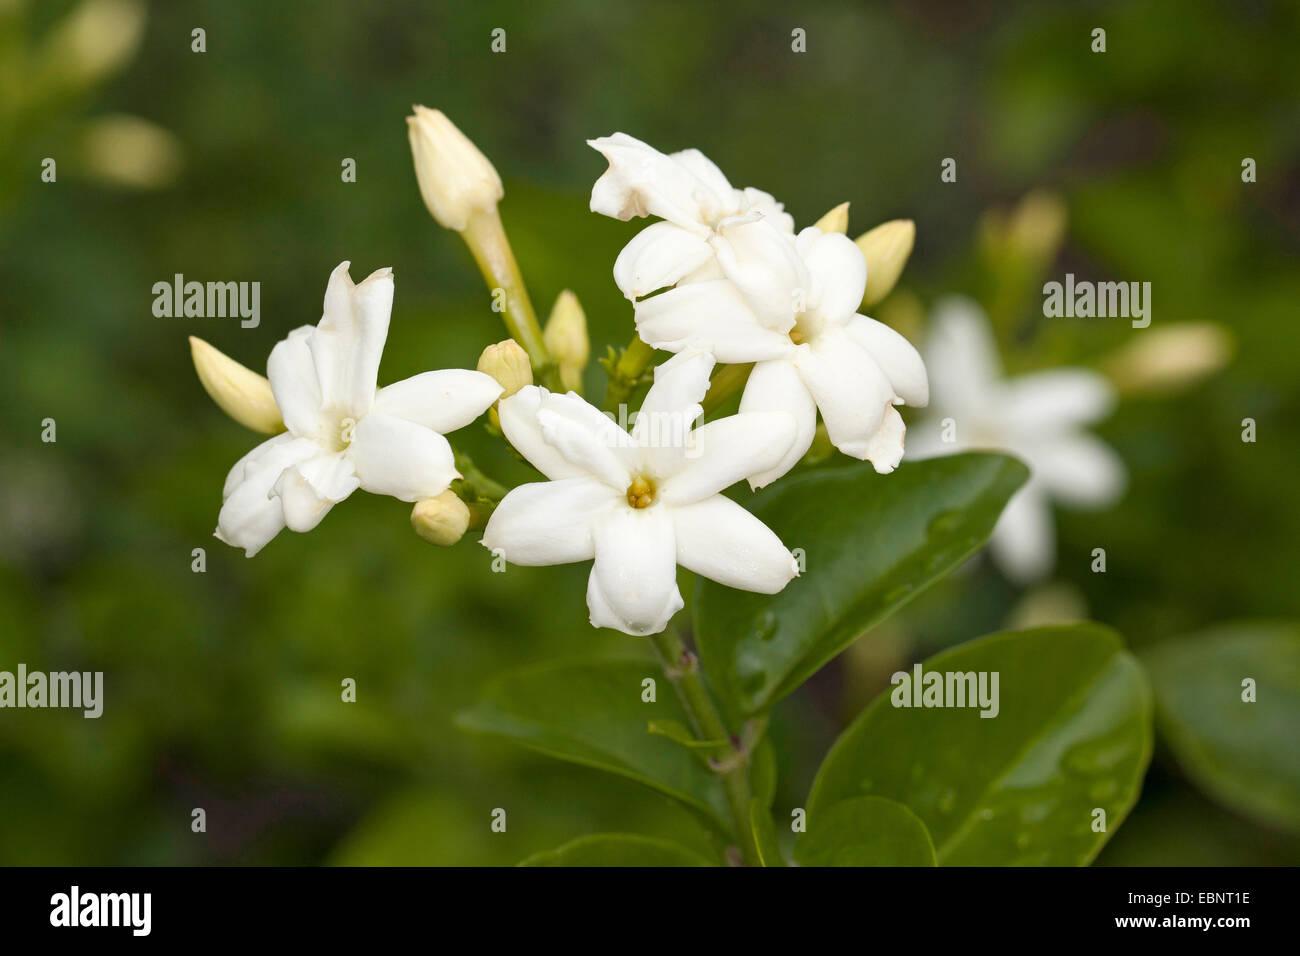 Arabian jasmine (Jasminum sambac), blooming - Stock Image